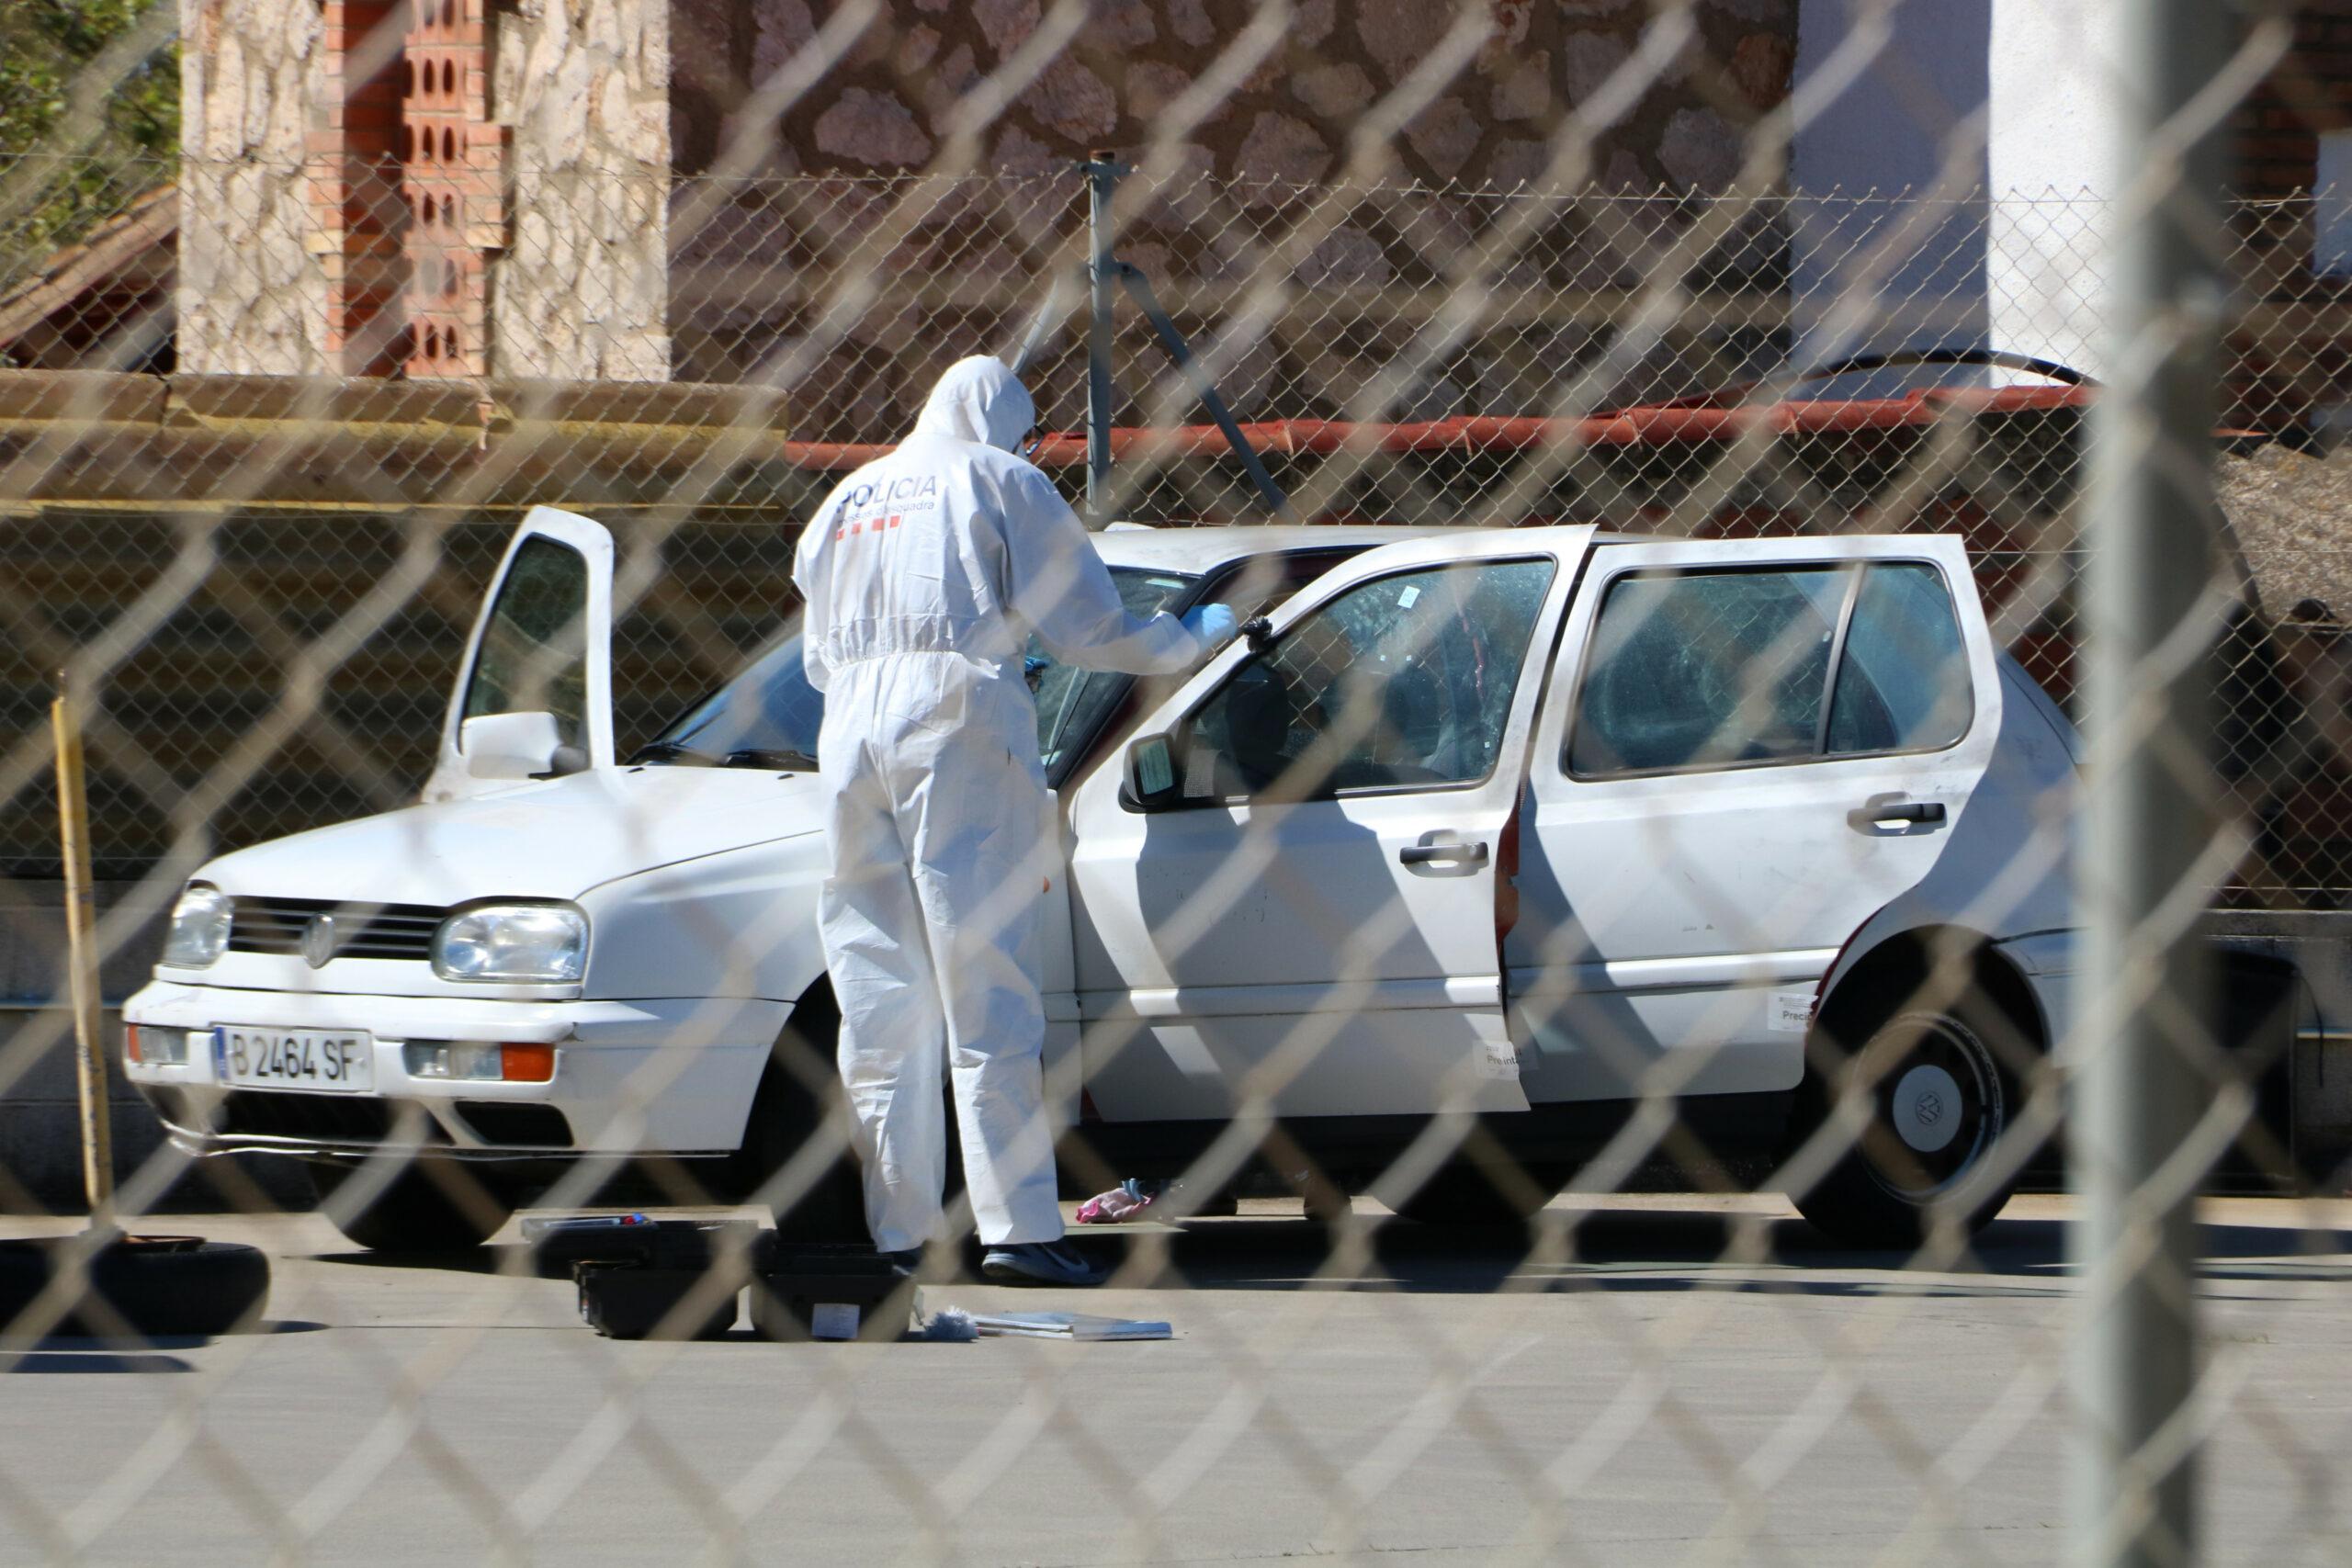 La policia científica inspeccionant el vehicle on va aparèixer el cadàver de Roses | ACN